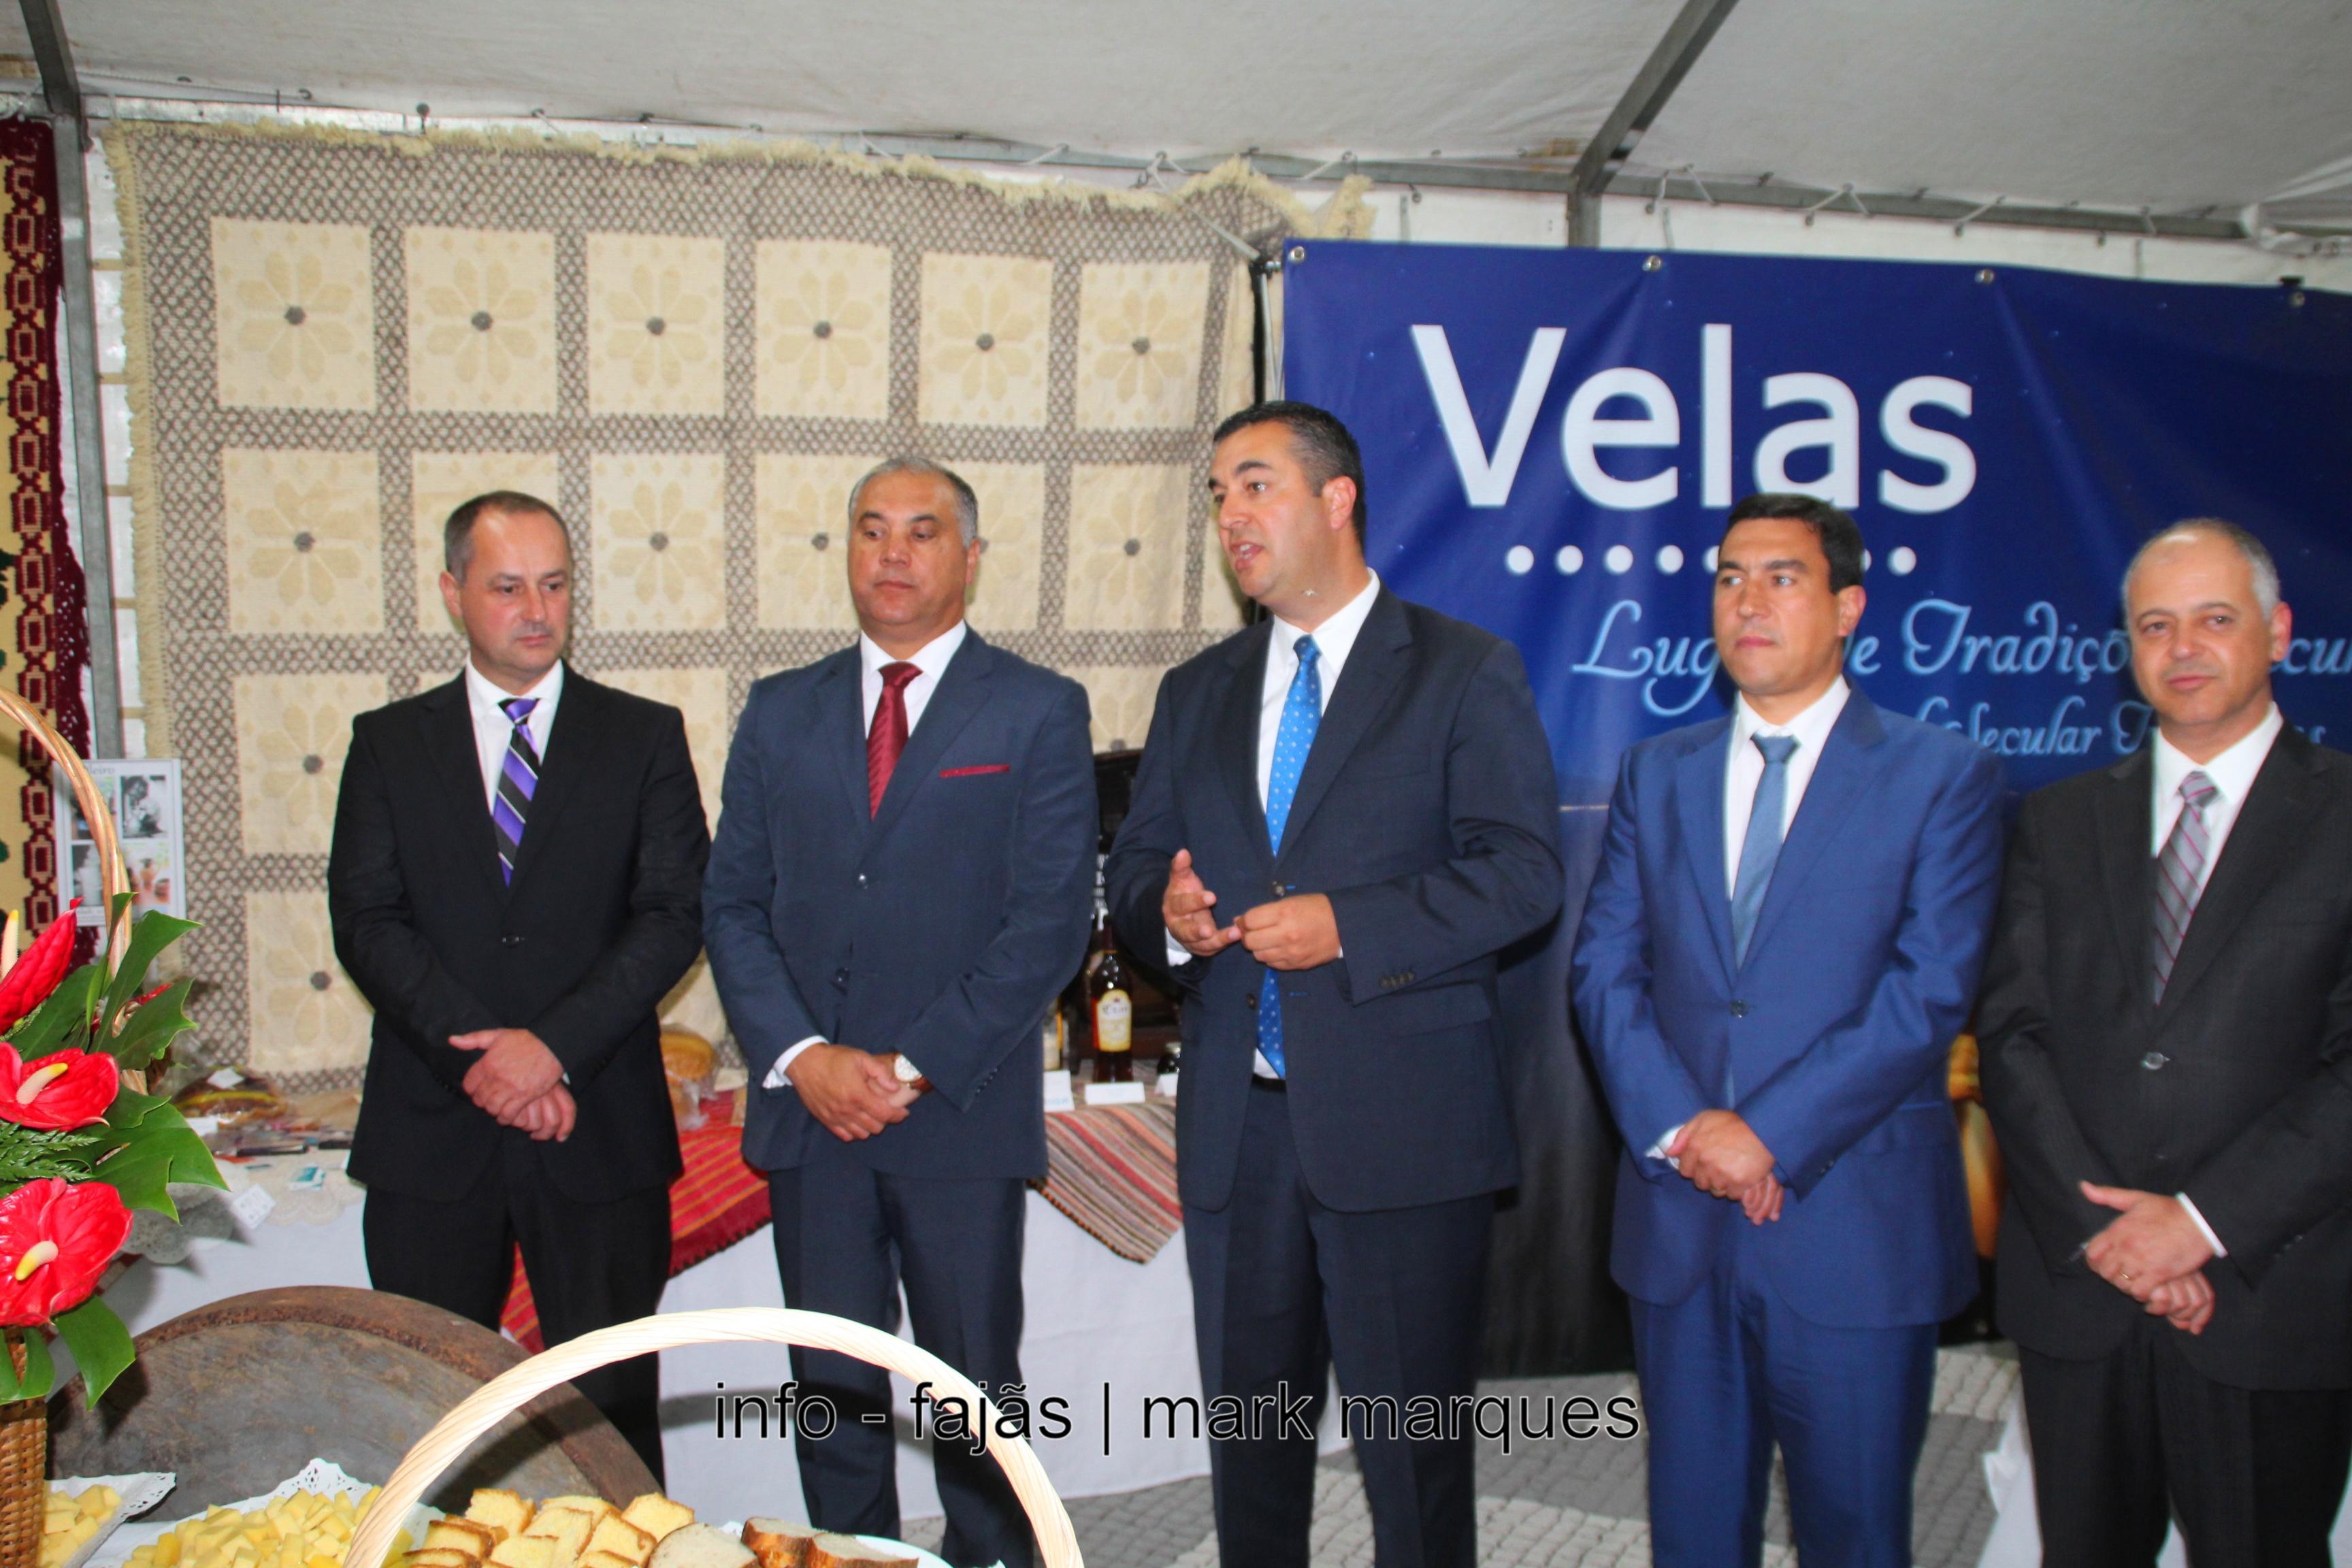 1º Dia da XXIX Semana Cultural das Velas (Quinta dia 30.06.2016) (reportagem fotográfica)